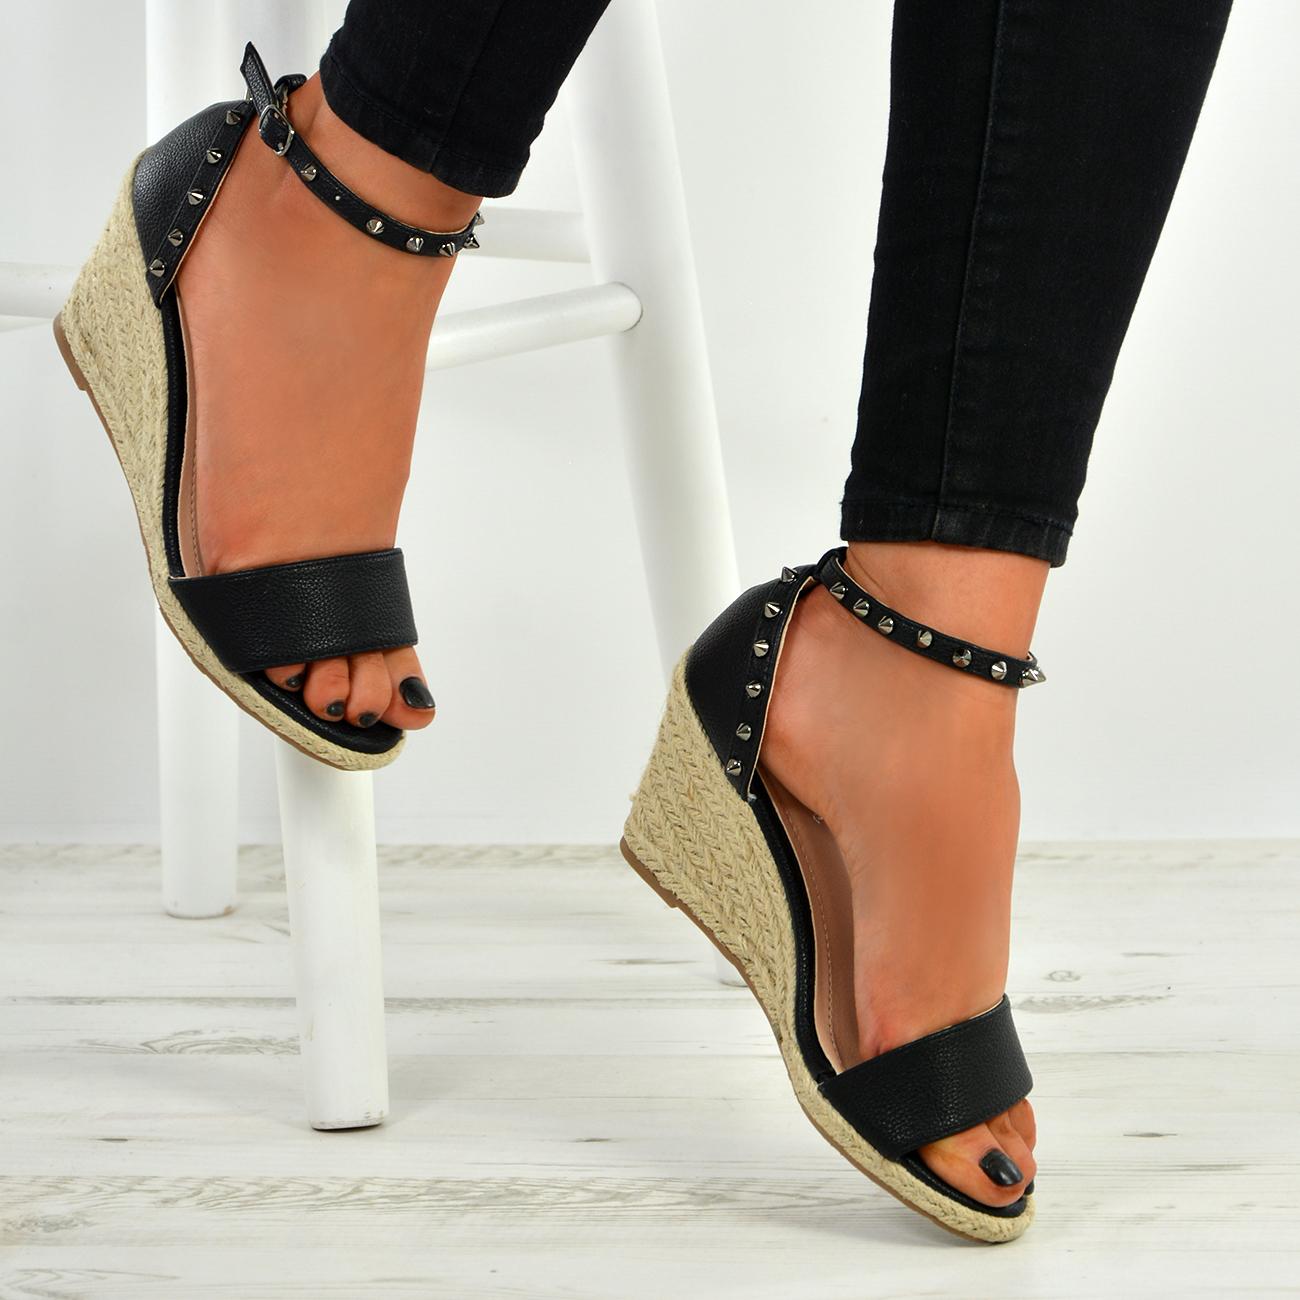 New Womens Ladies Rock Studs Peep Toe Espadrille Wedge Platforms Sandals Shoes